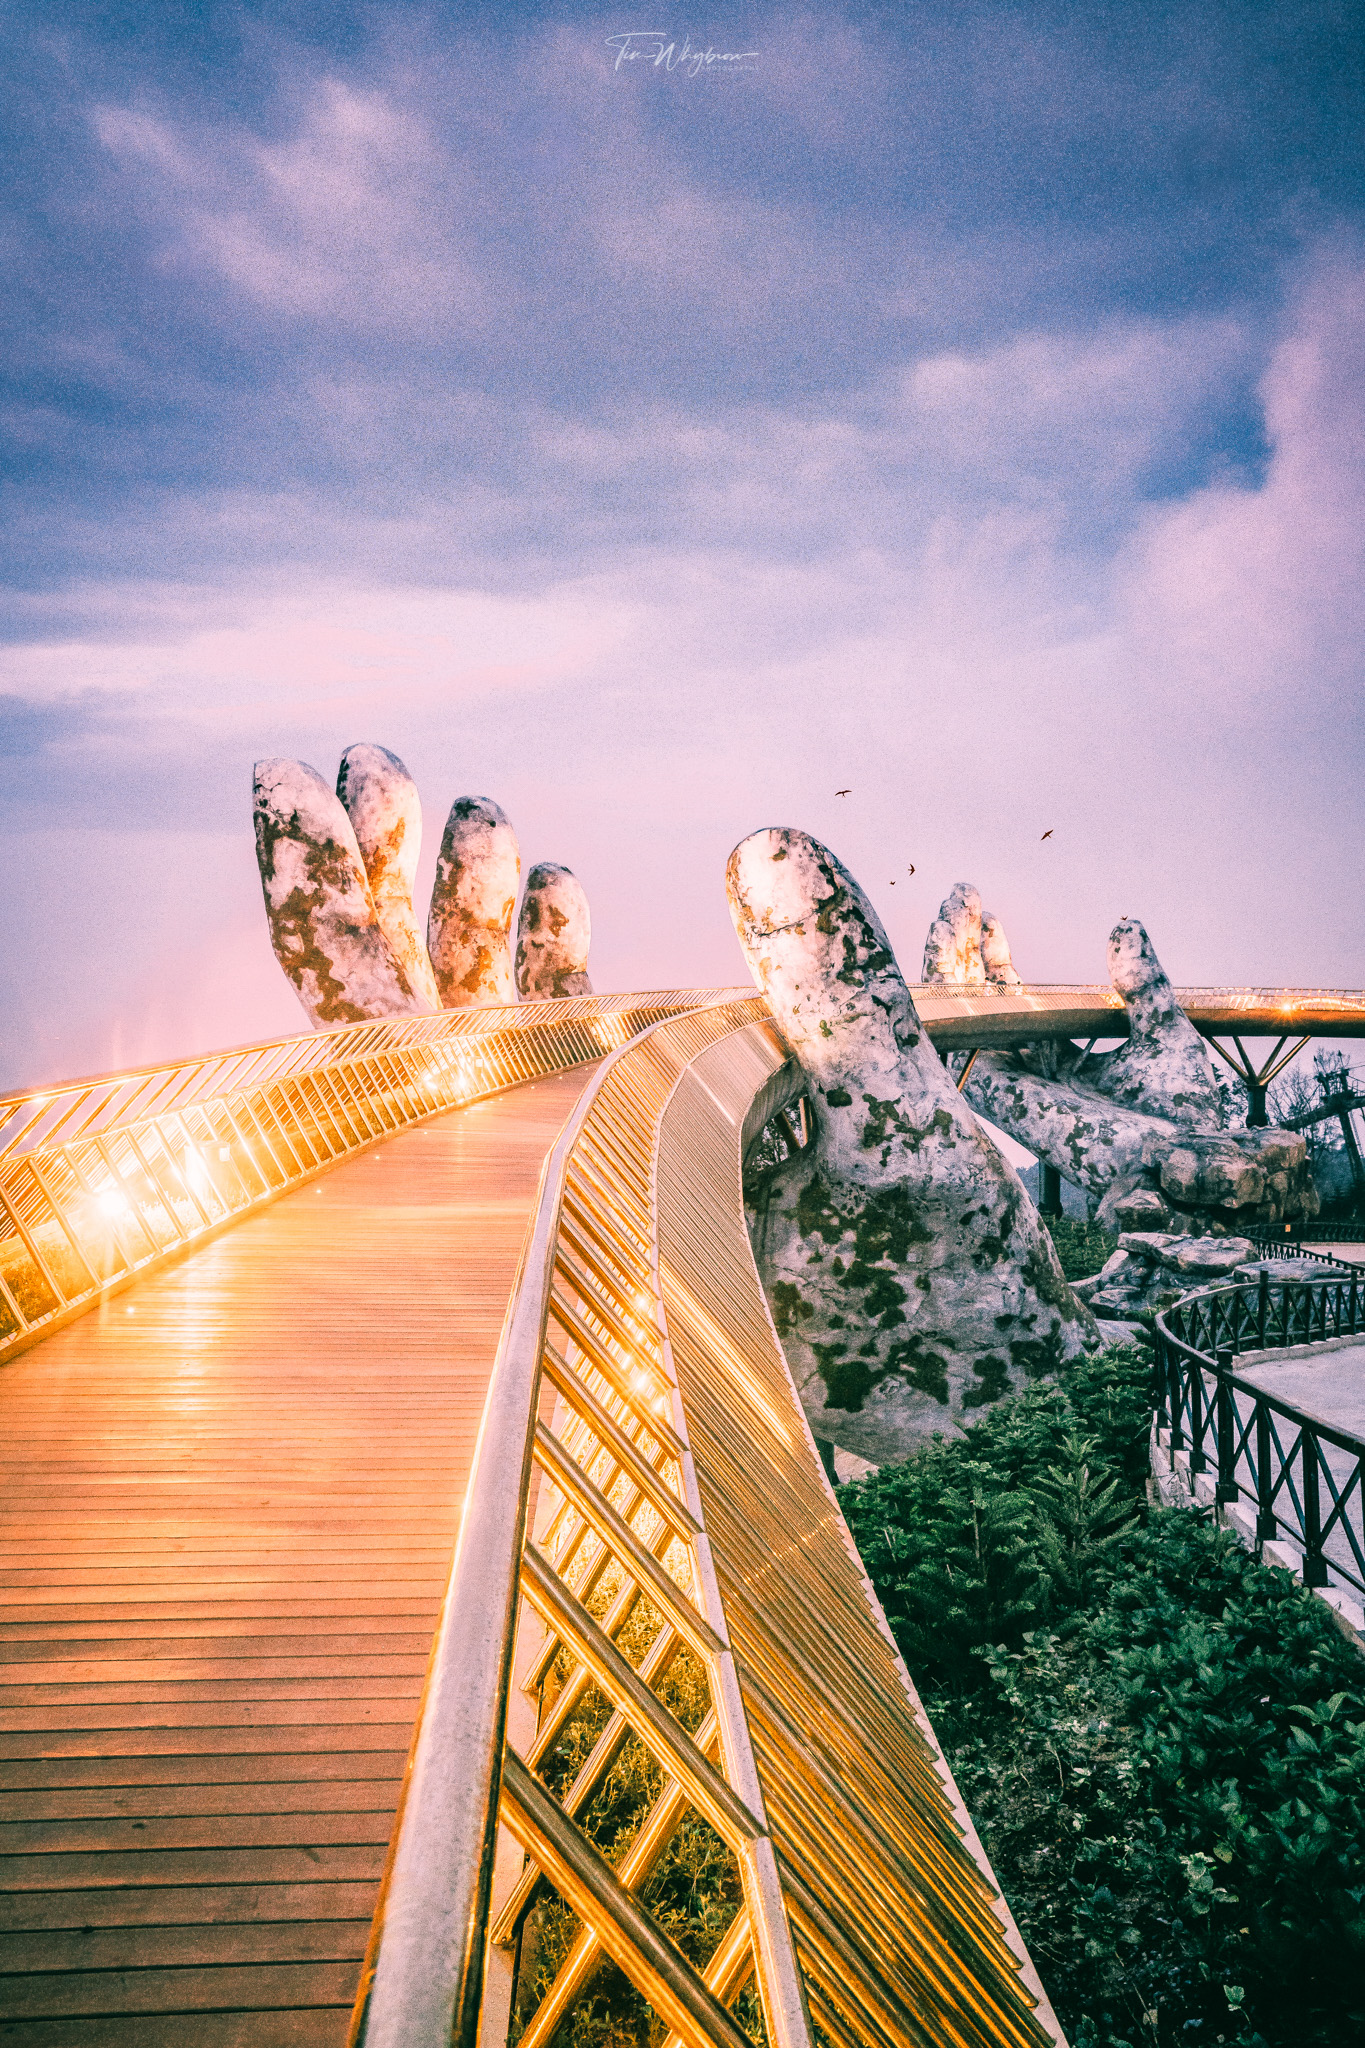 Golden Hand Bridge Vietnam   Instagram: @timwhybrow_